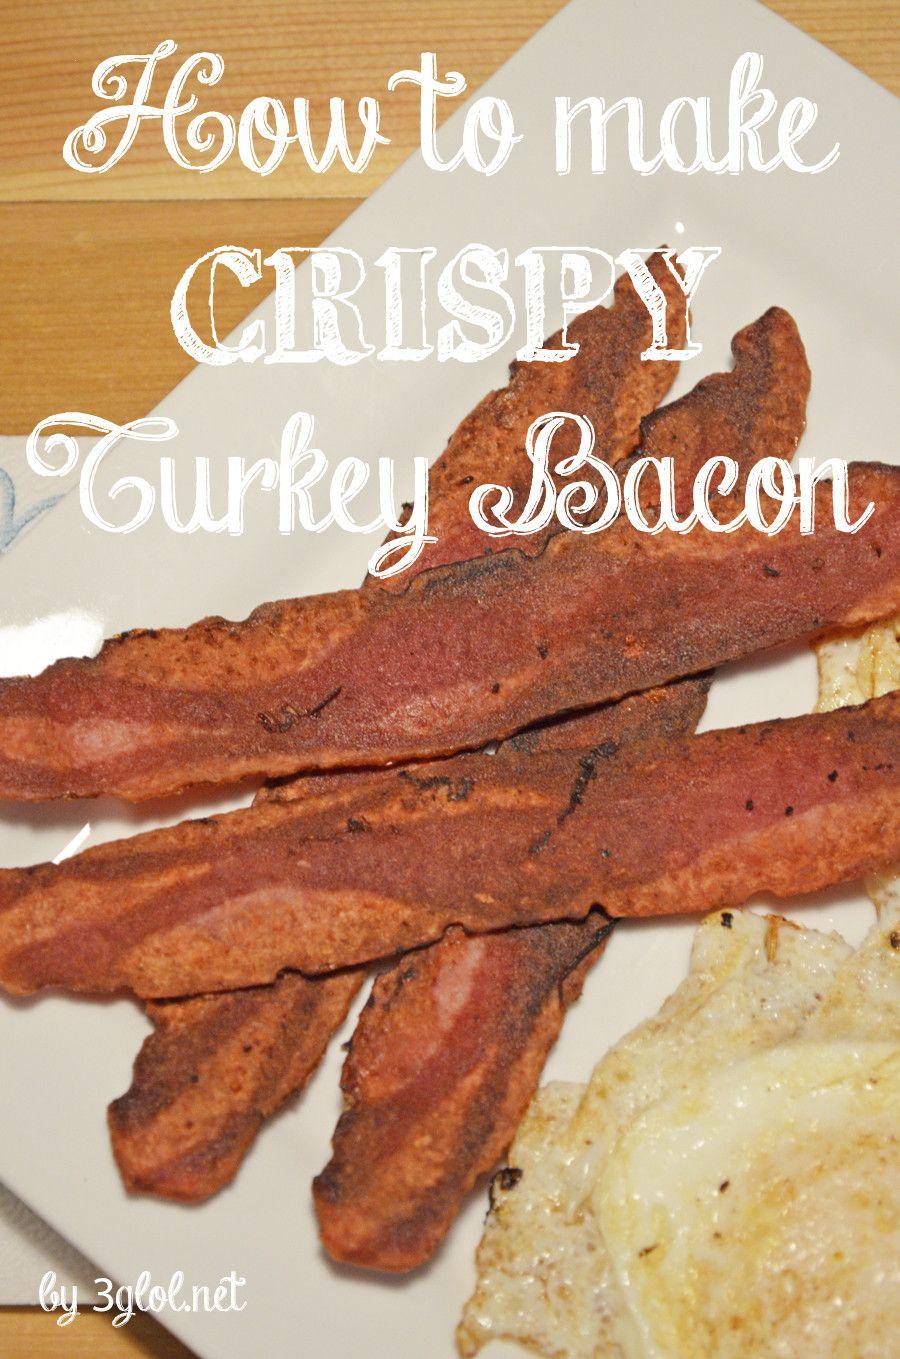 How To Make Crispy Turkey Bacon Eating Healthy But Like Crispy Bacon?  Here's A